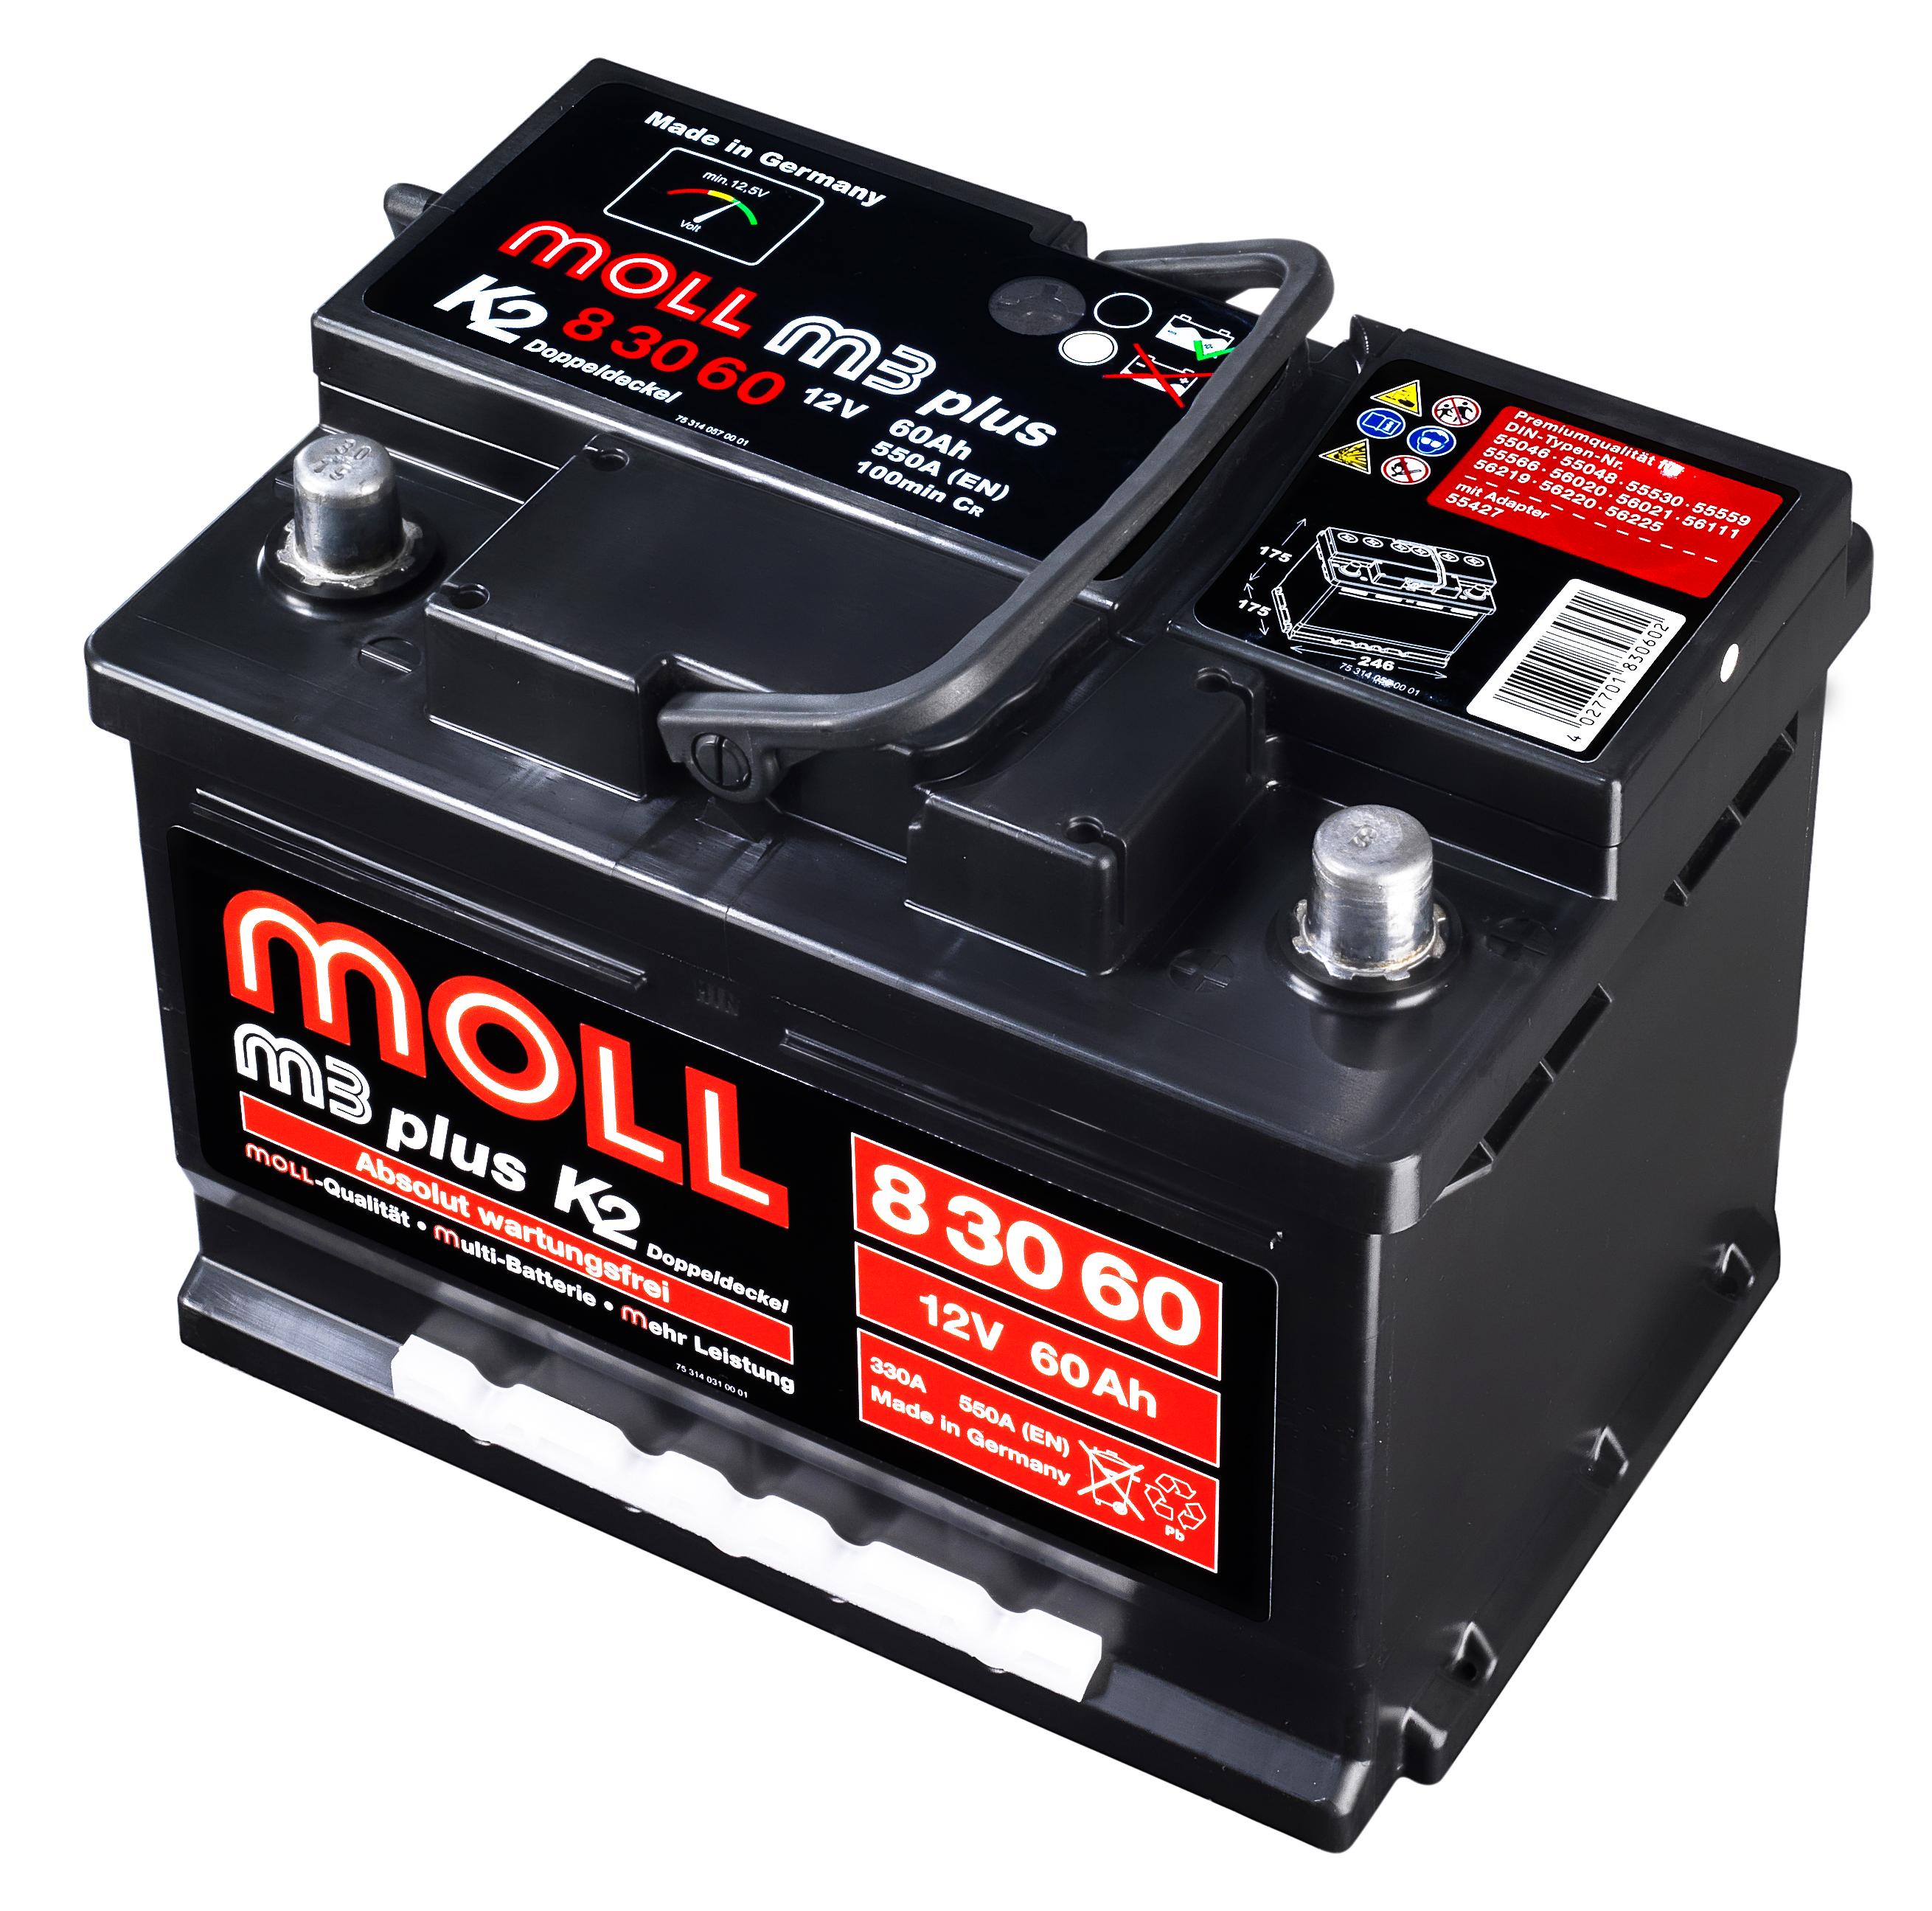 MOLL M3 plus K2 83060